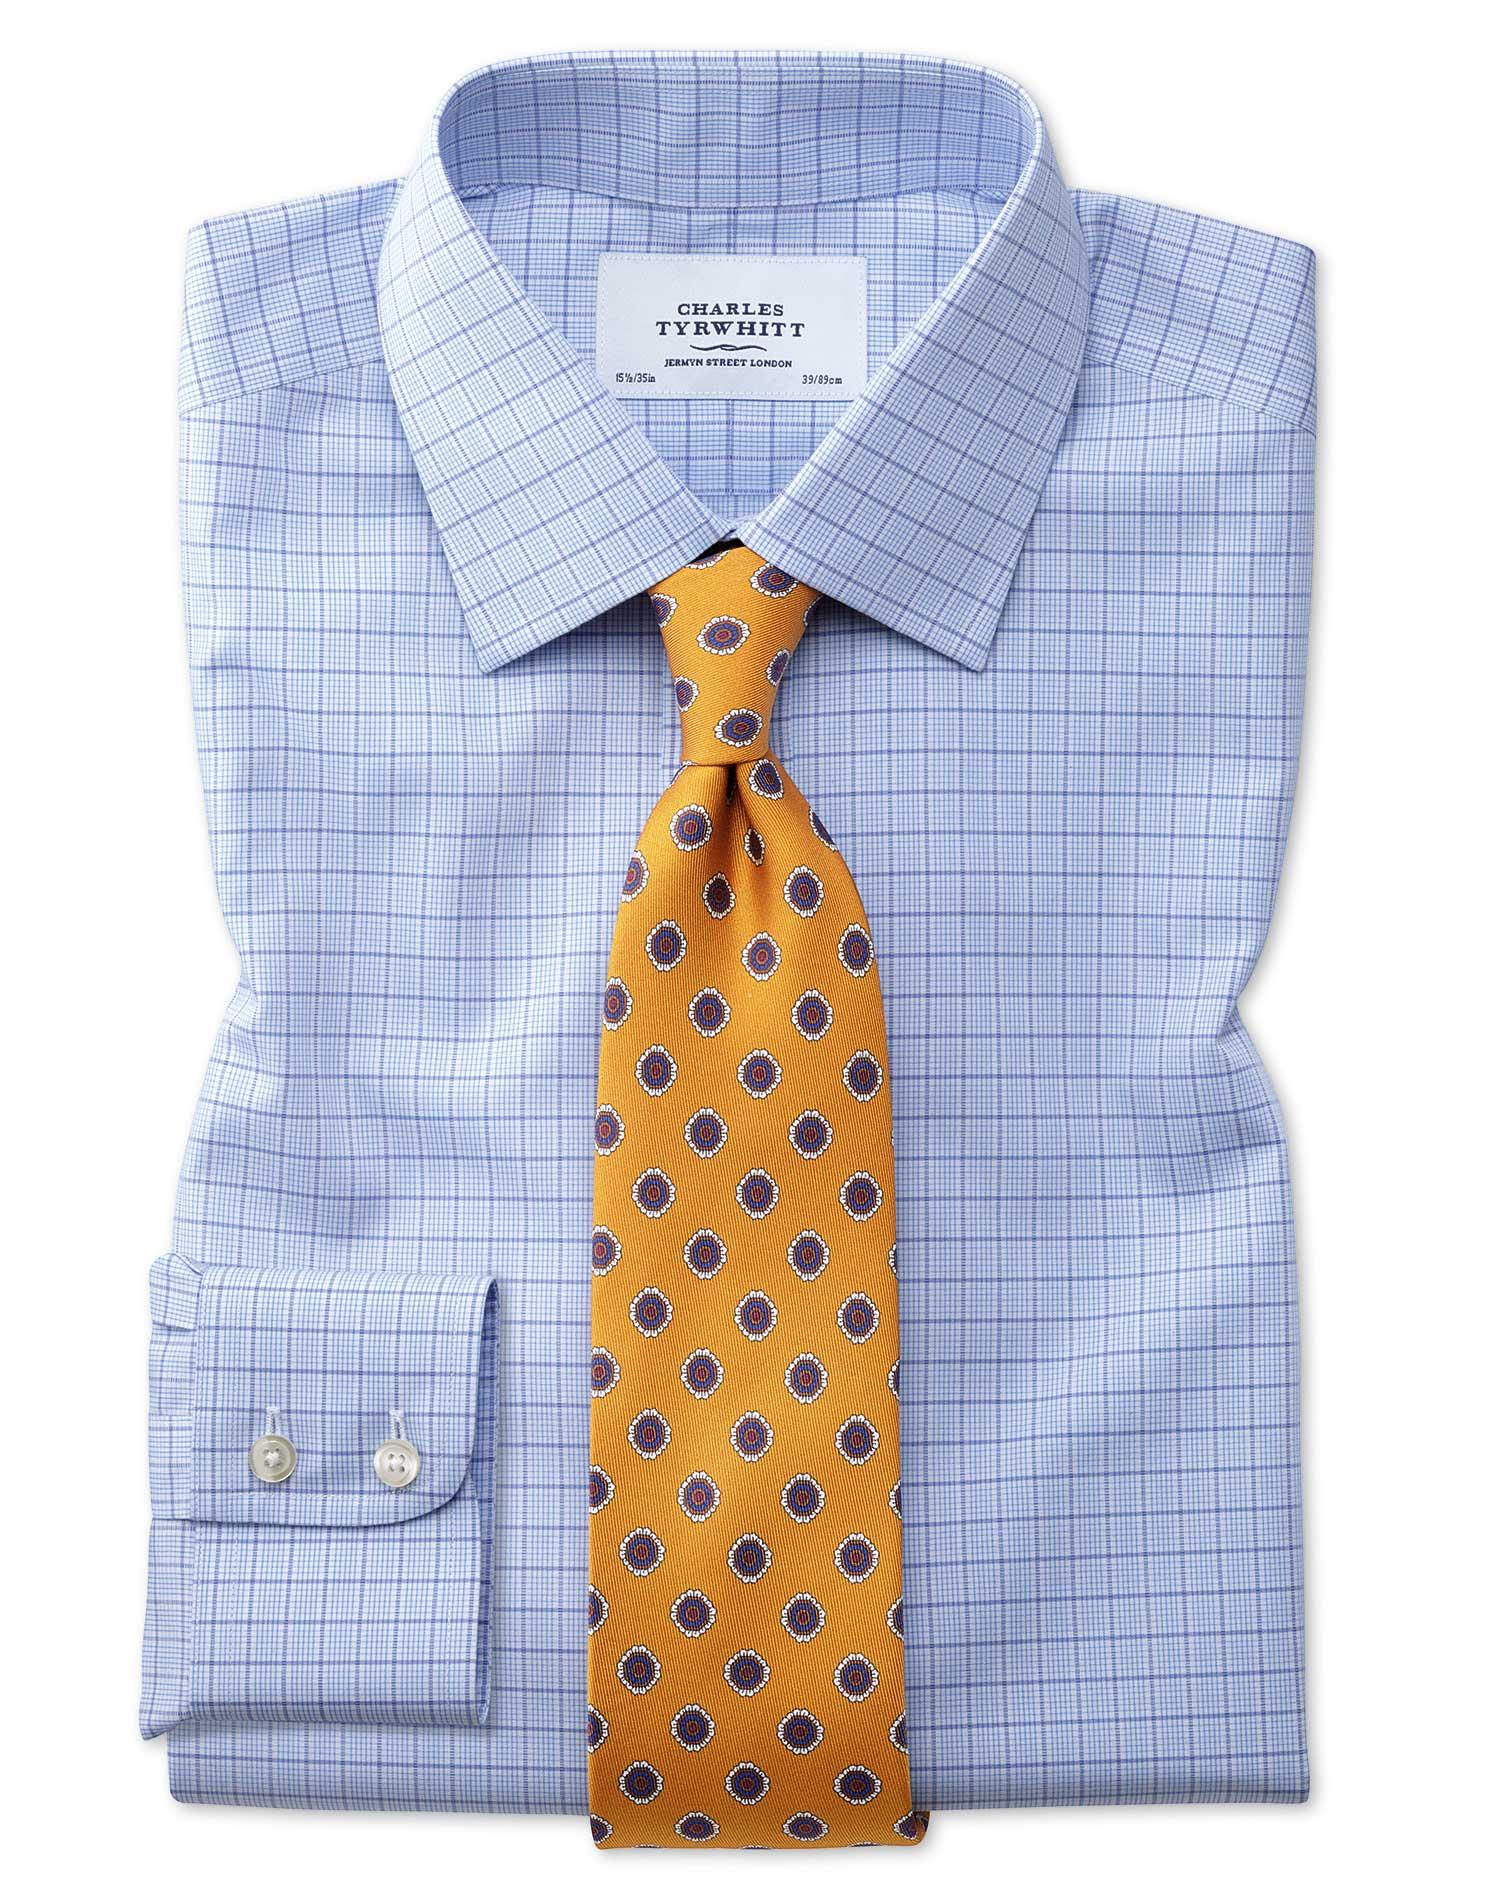 Slim Fit Non-Iron Multi Check Blue Cotton Formal Shirt Single Cuff Size 16/36 by Charles Tyrwhitt